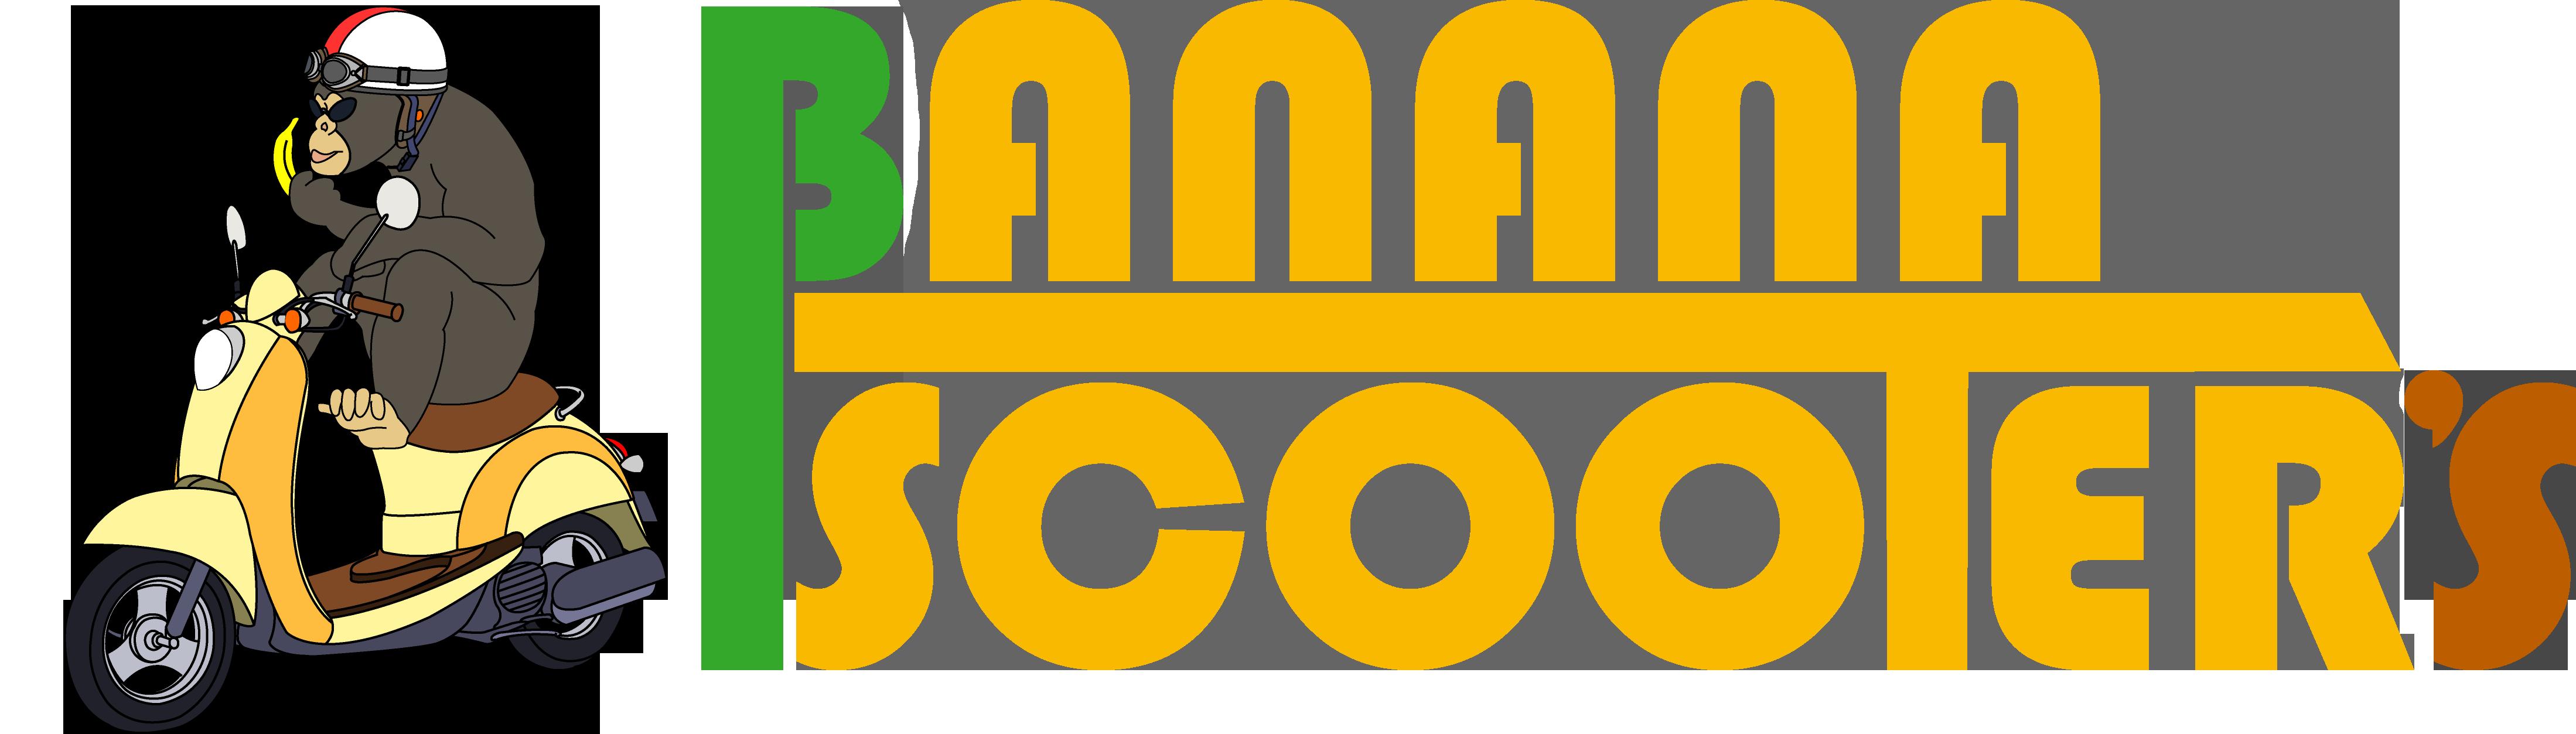 BANANASCOOTER'S~バナナスクーターズ~ブログ